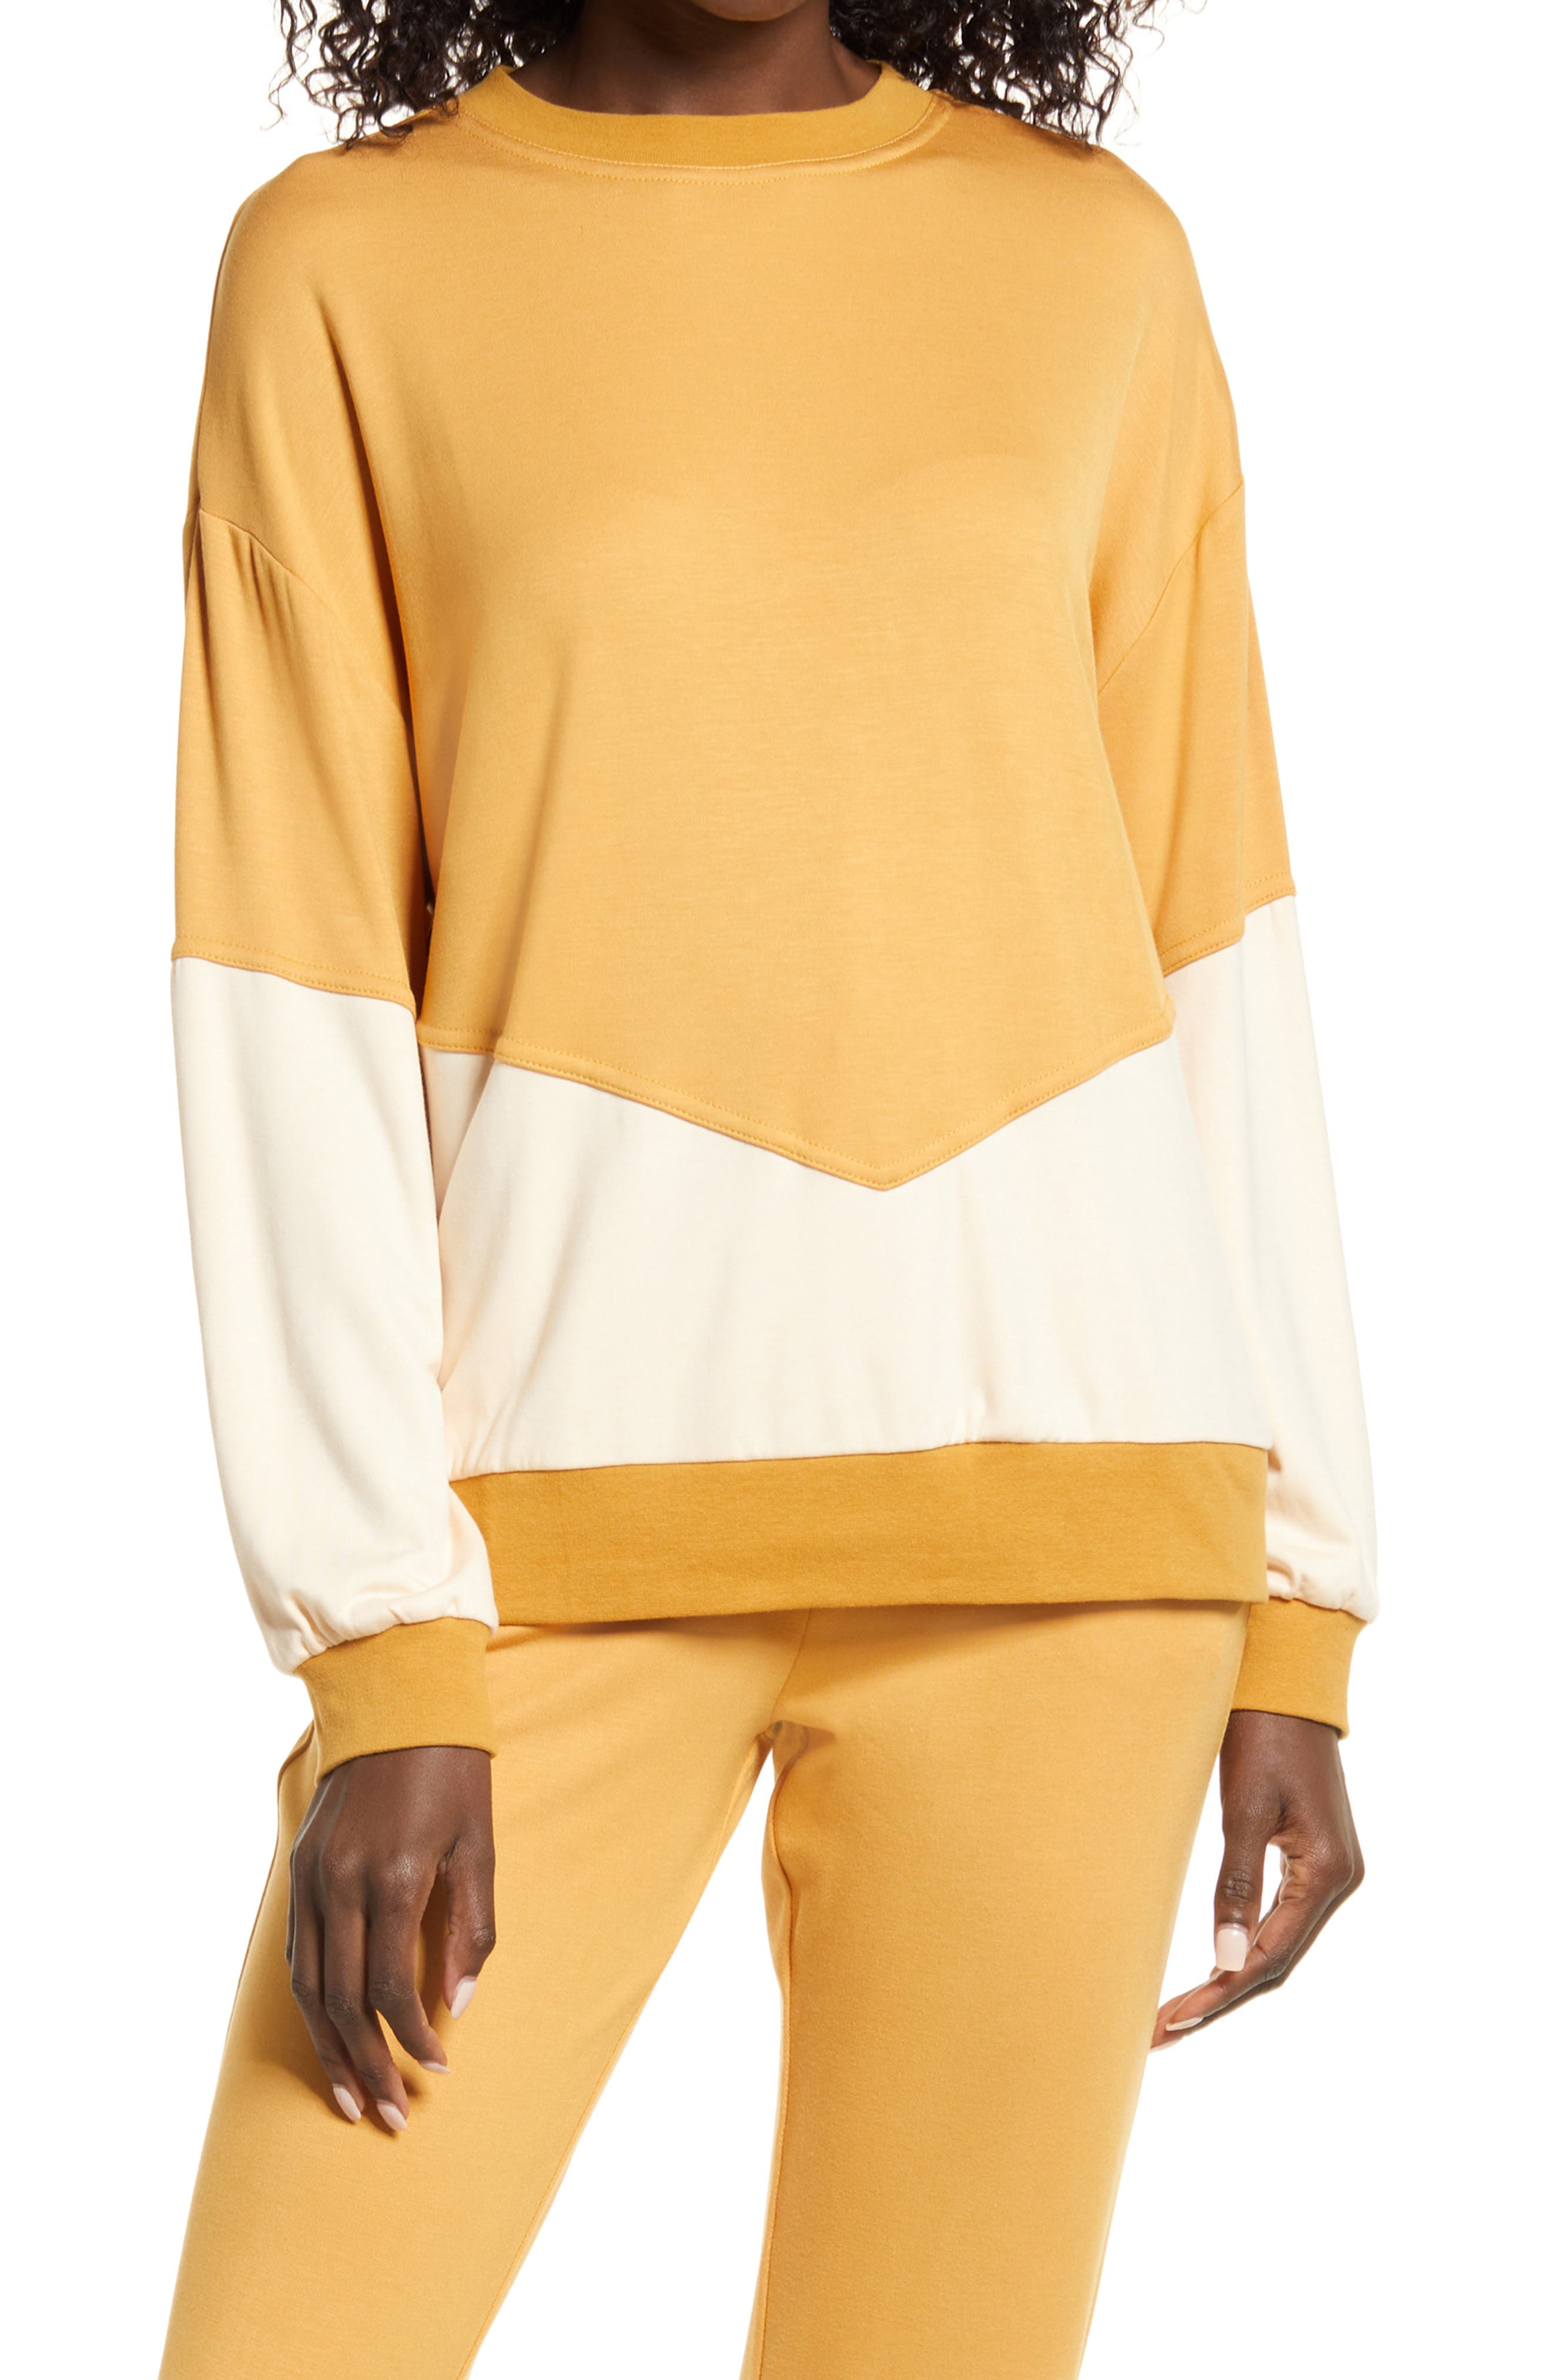 Women's Kendall + Kylie Colorblock Sweatshirt